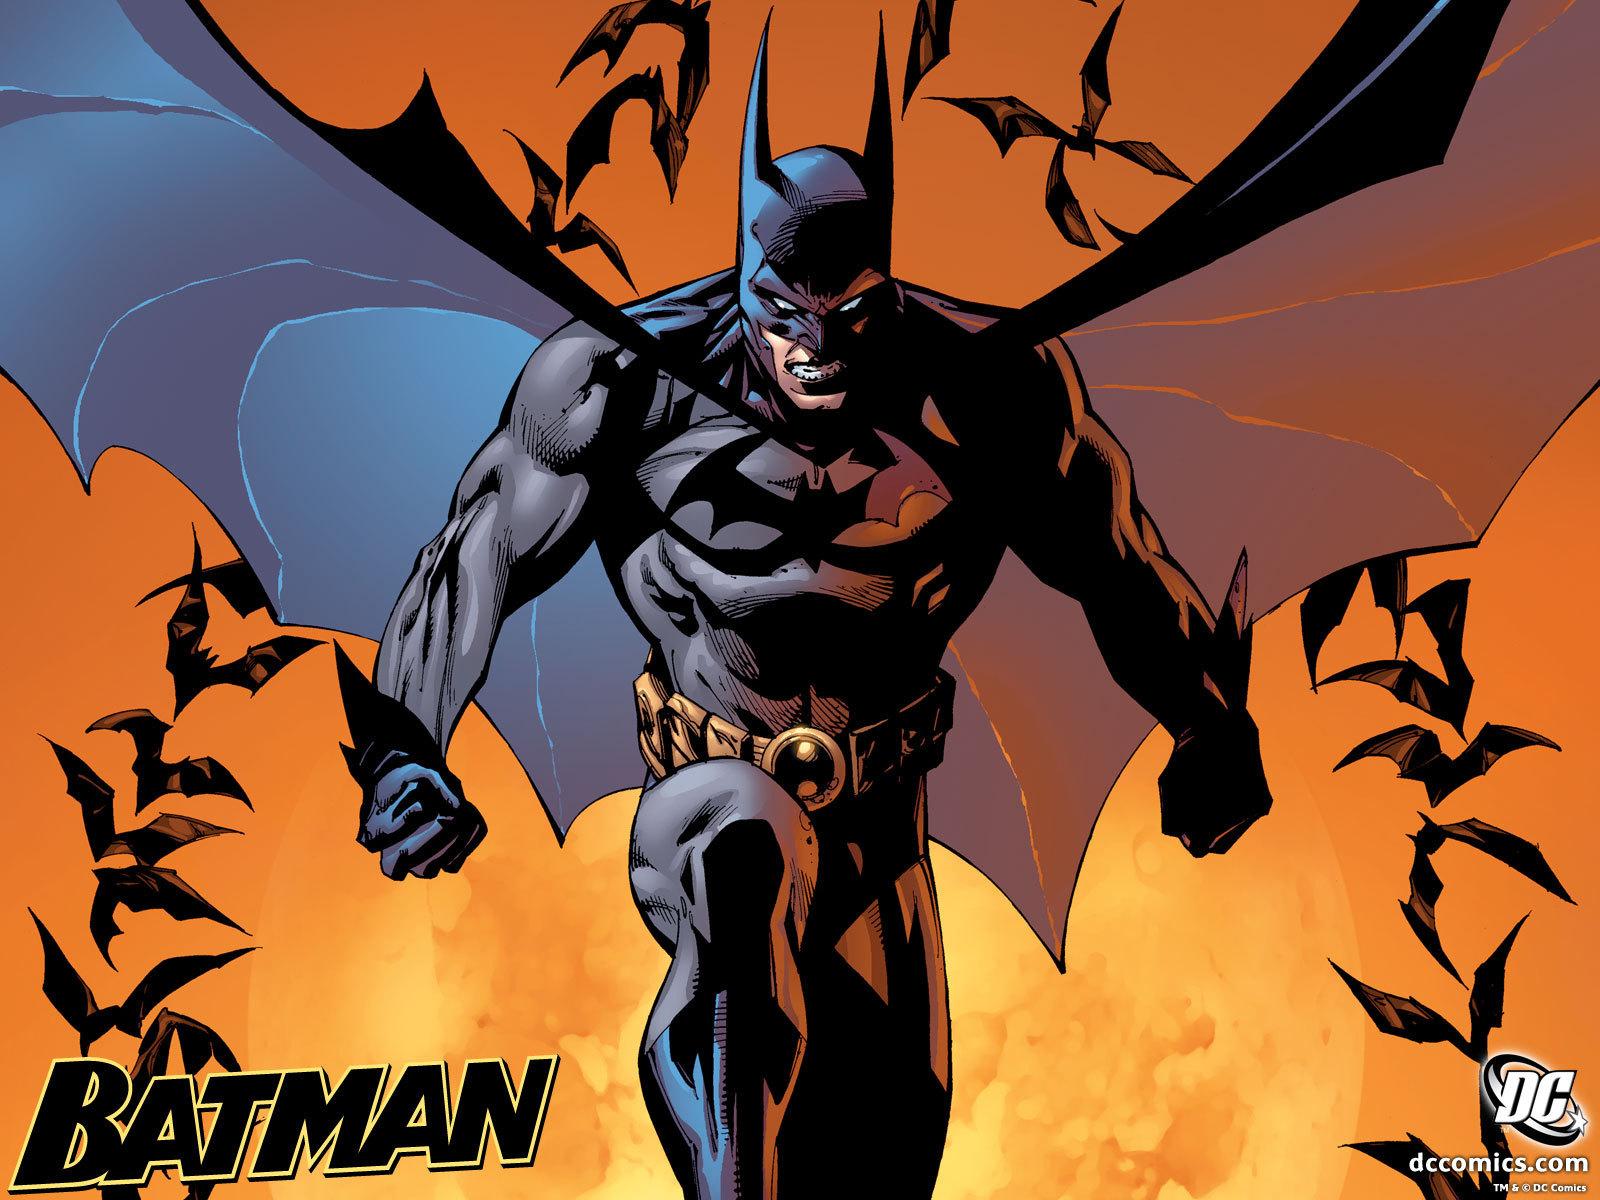 Batman #687